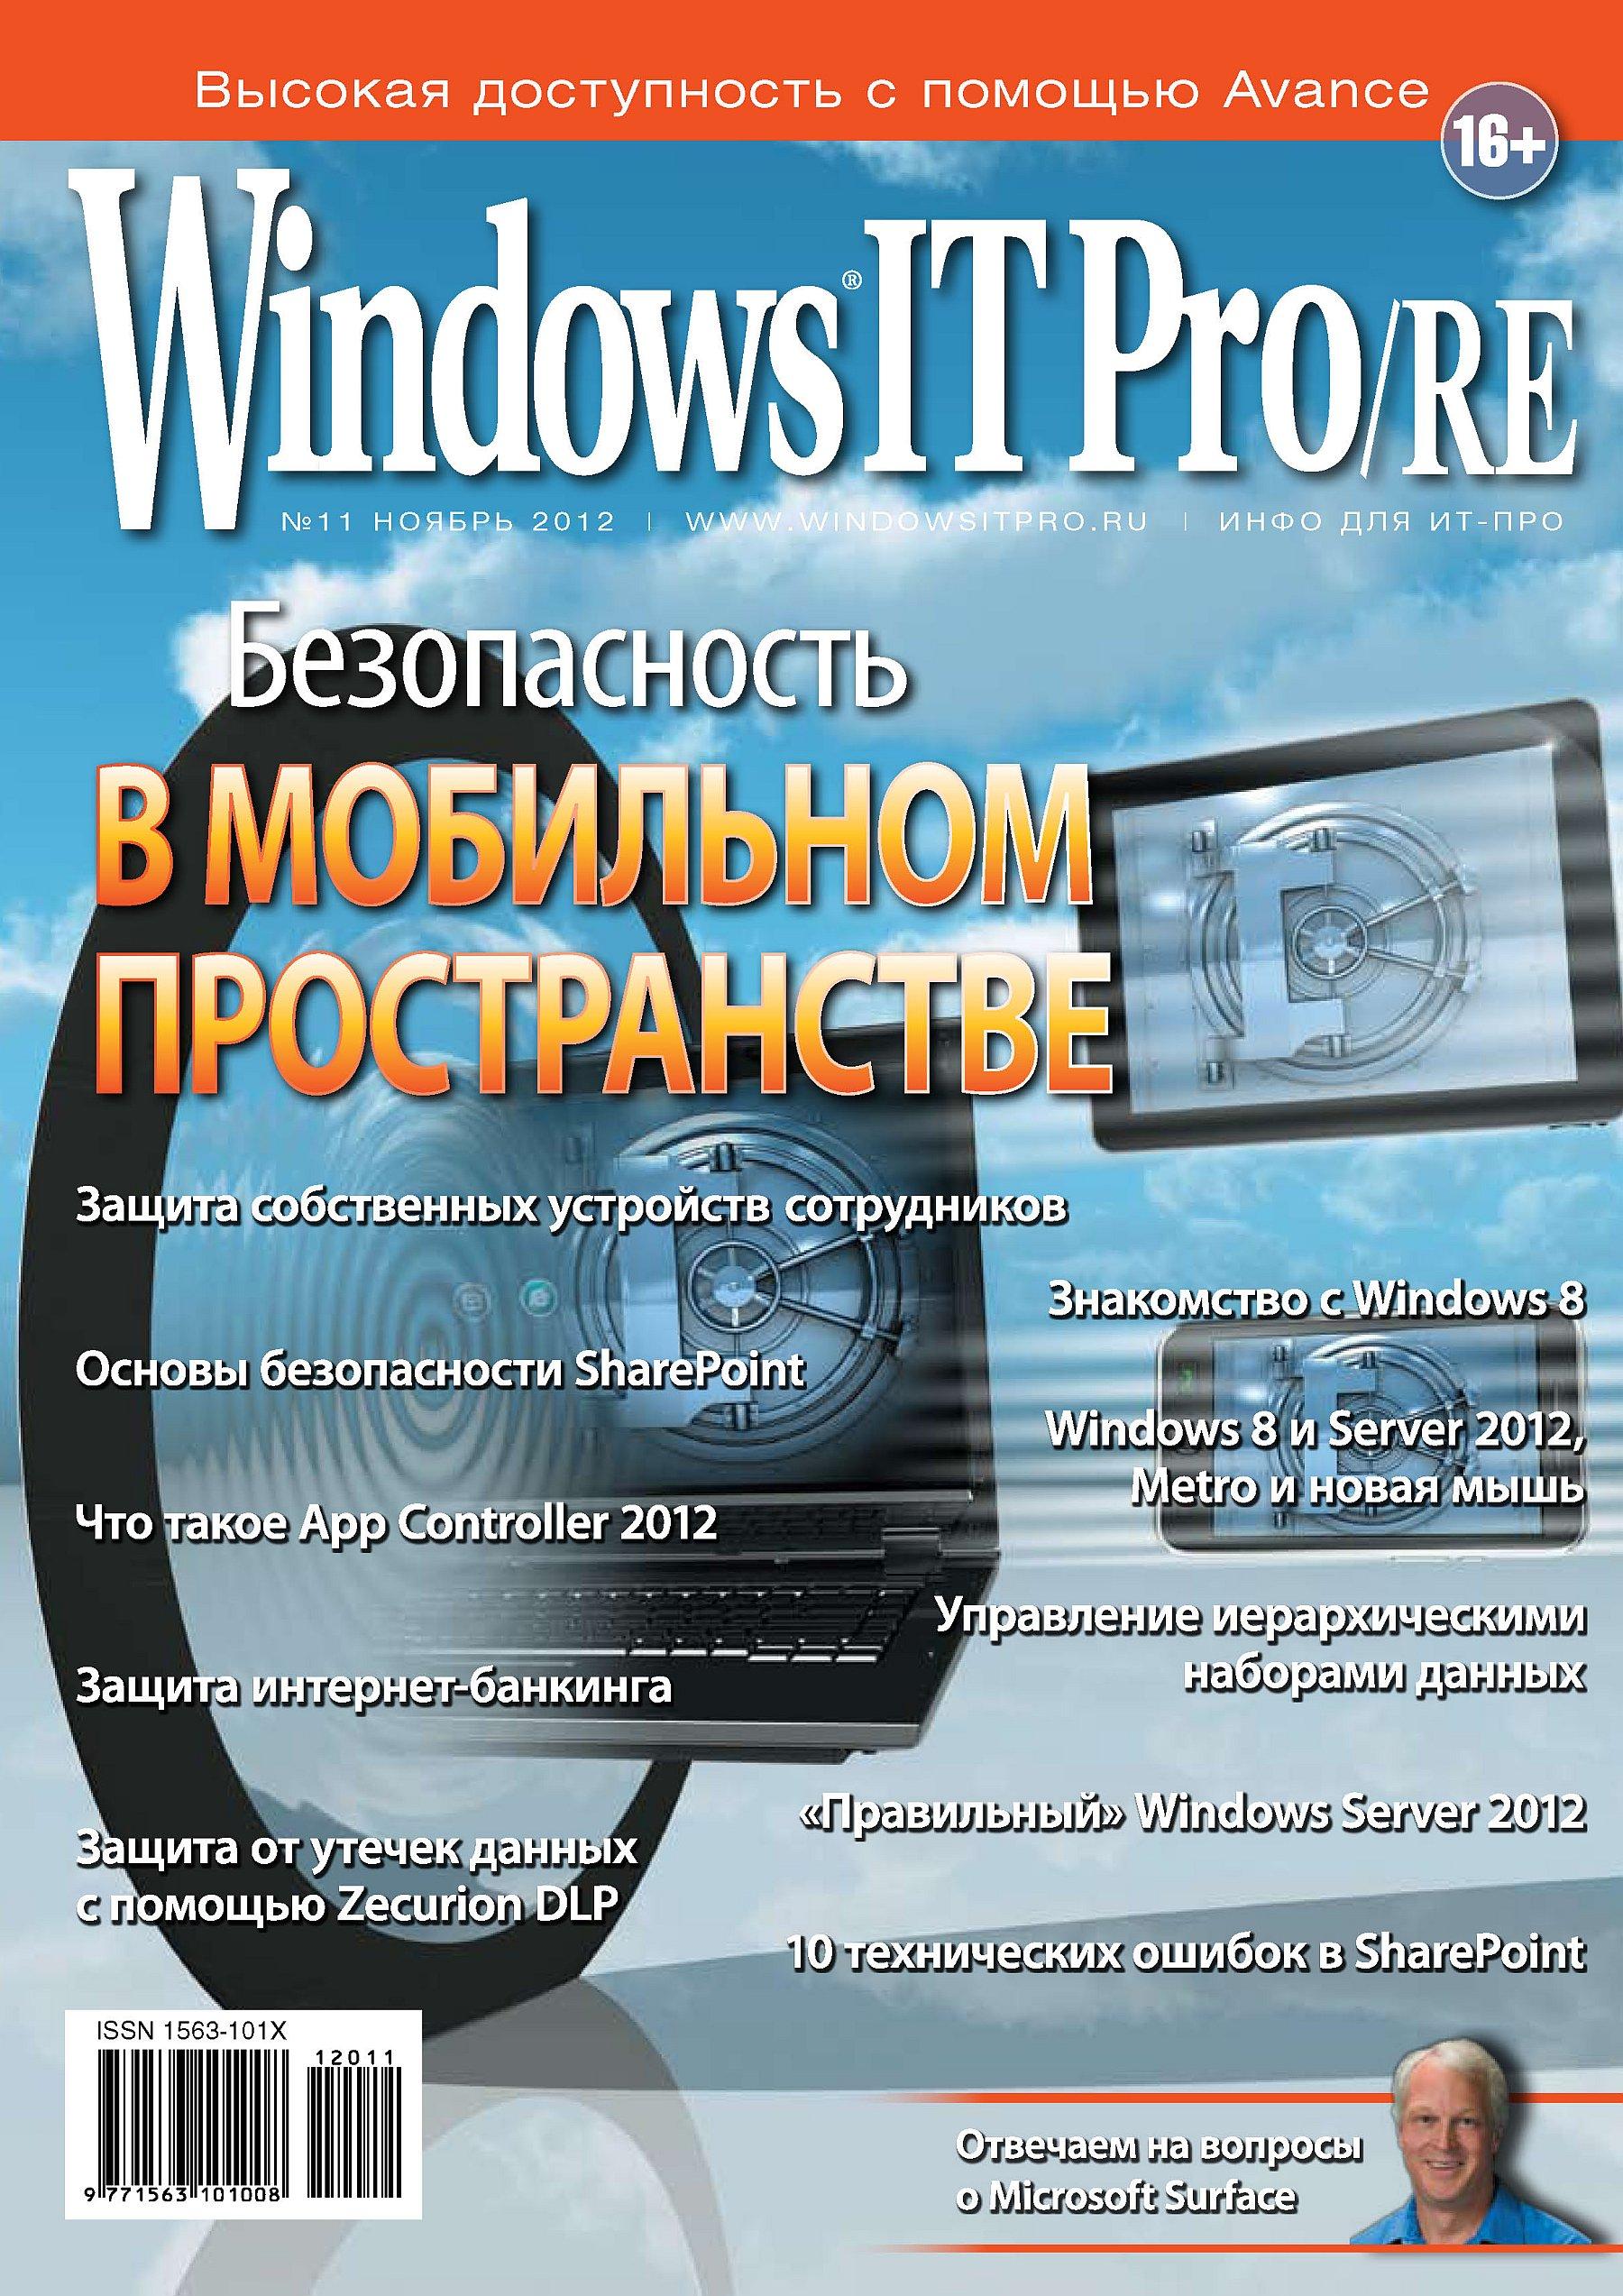 Открытые системы Windows IT Pro/RE №11/2012 открытые системы windows it pro re 10 2012